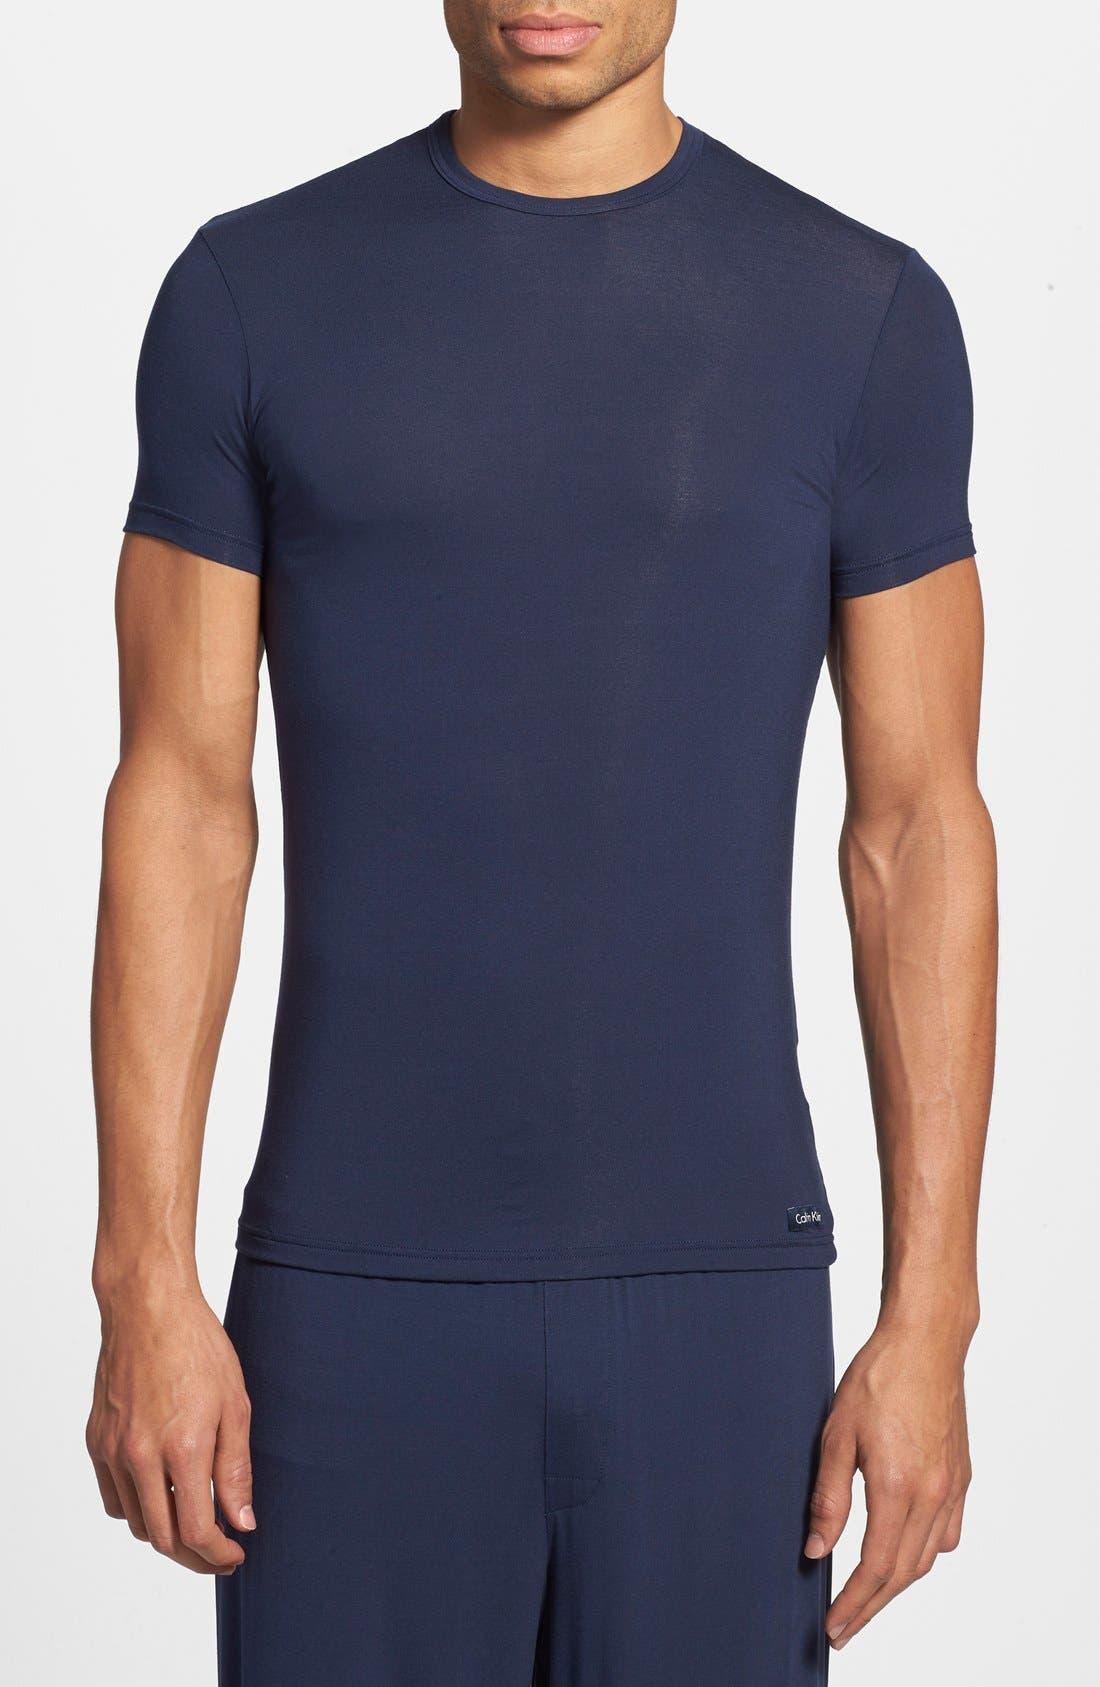 CALVIN KLEIN U5551 Modal Blend Crewneck T-Shirt